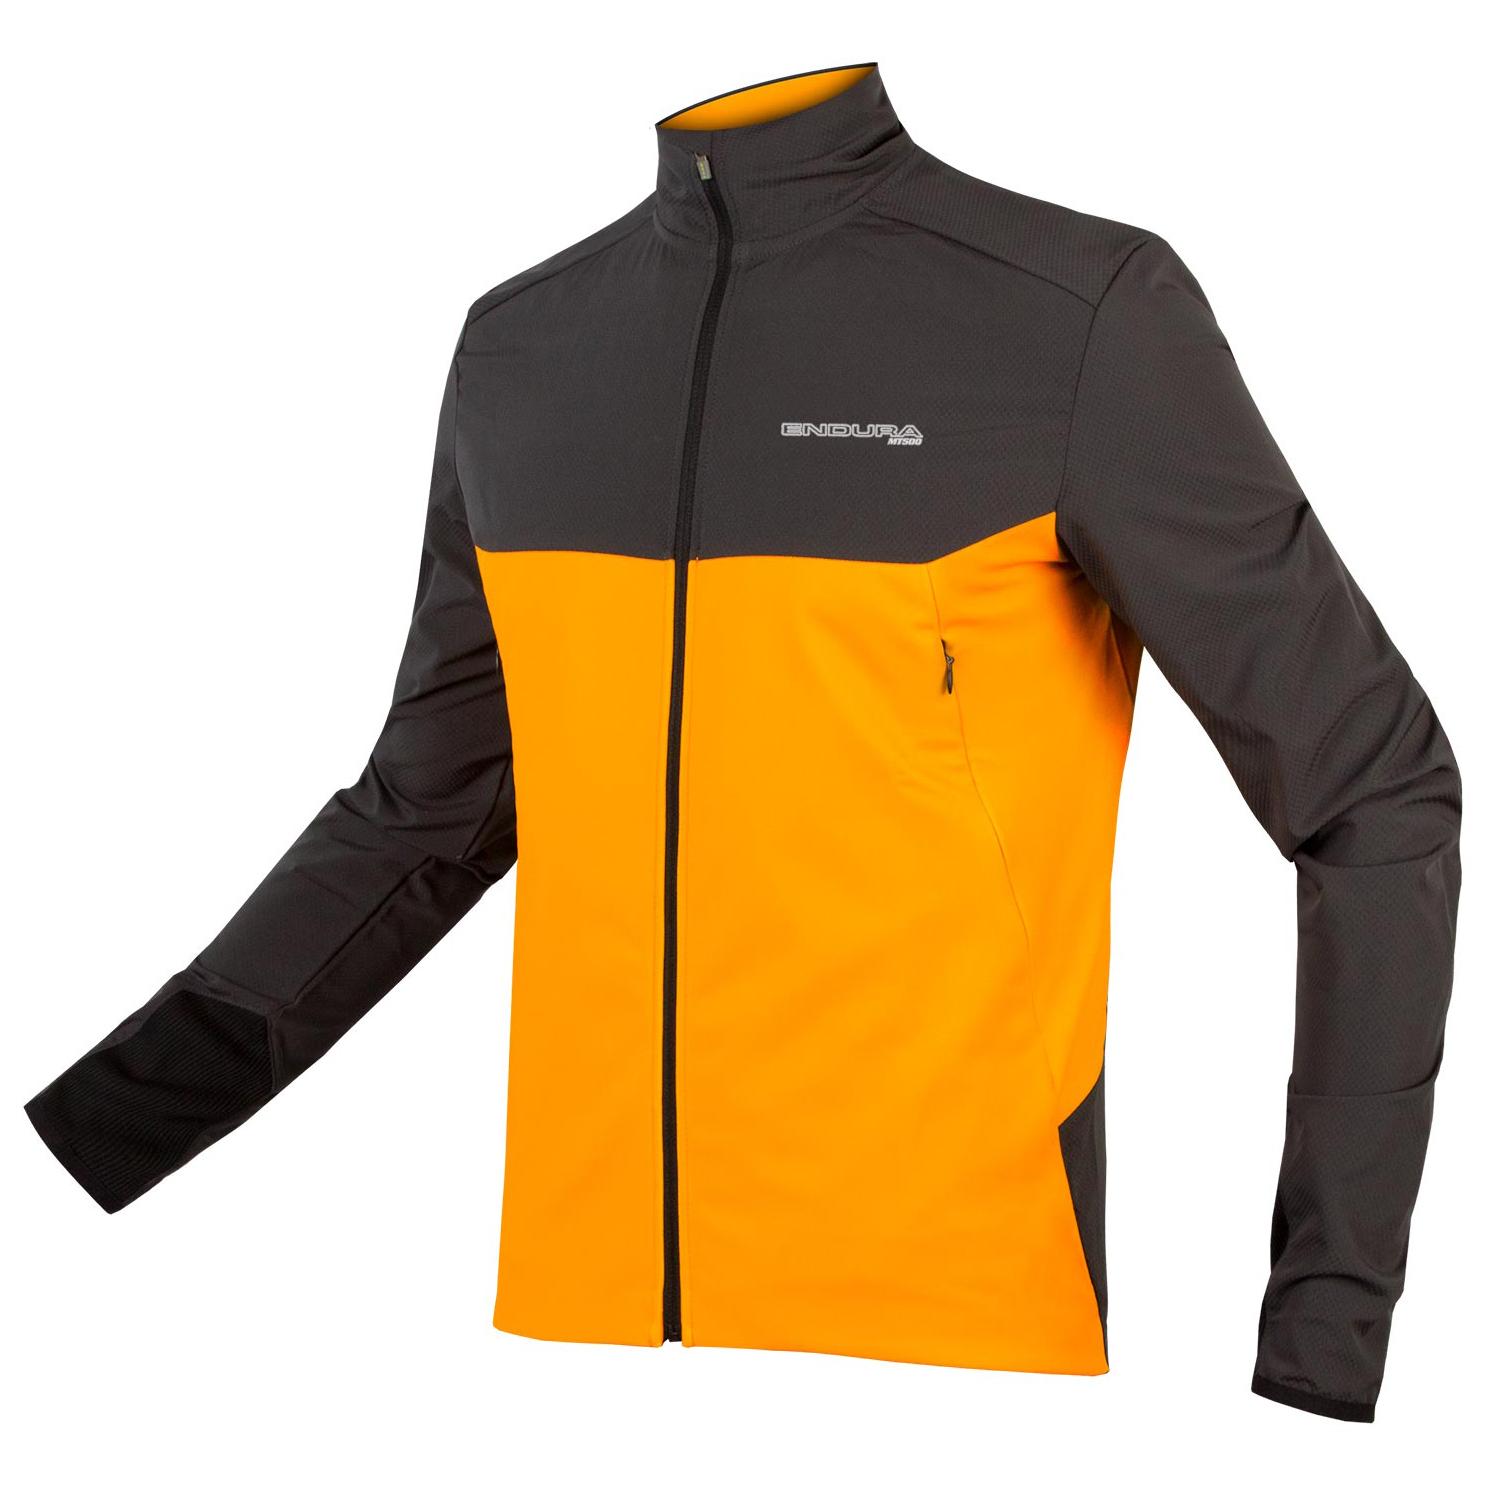 Ciclismo Franco Porto Thermo Jersey Endura Mt500 Giacca Uomo Ls A8W7X